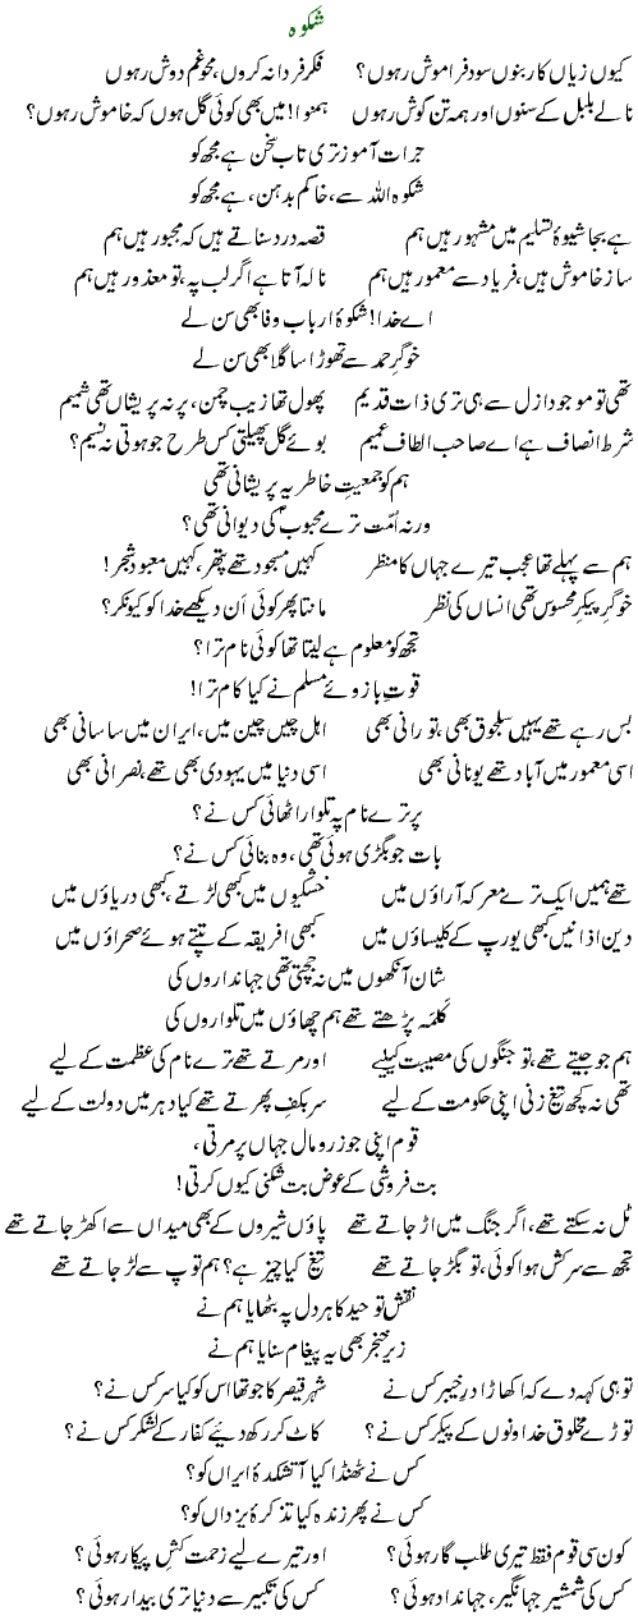 allama iqbal shikwa pdf